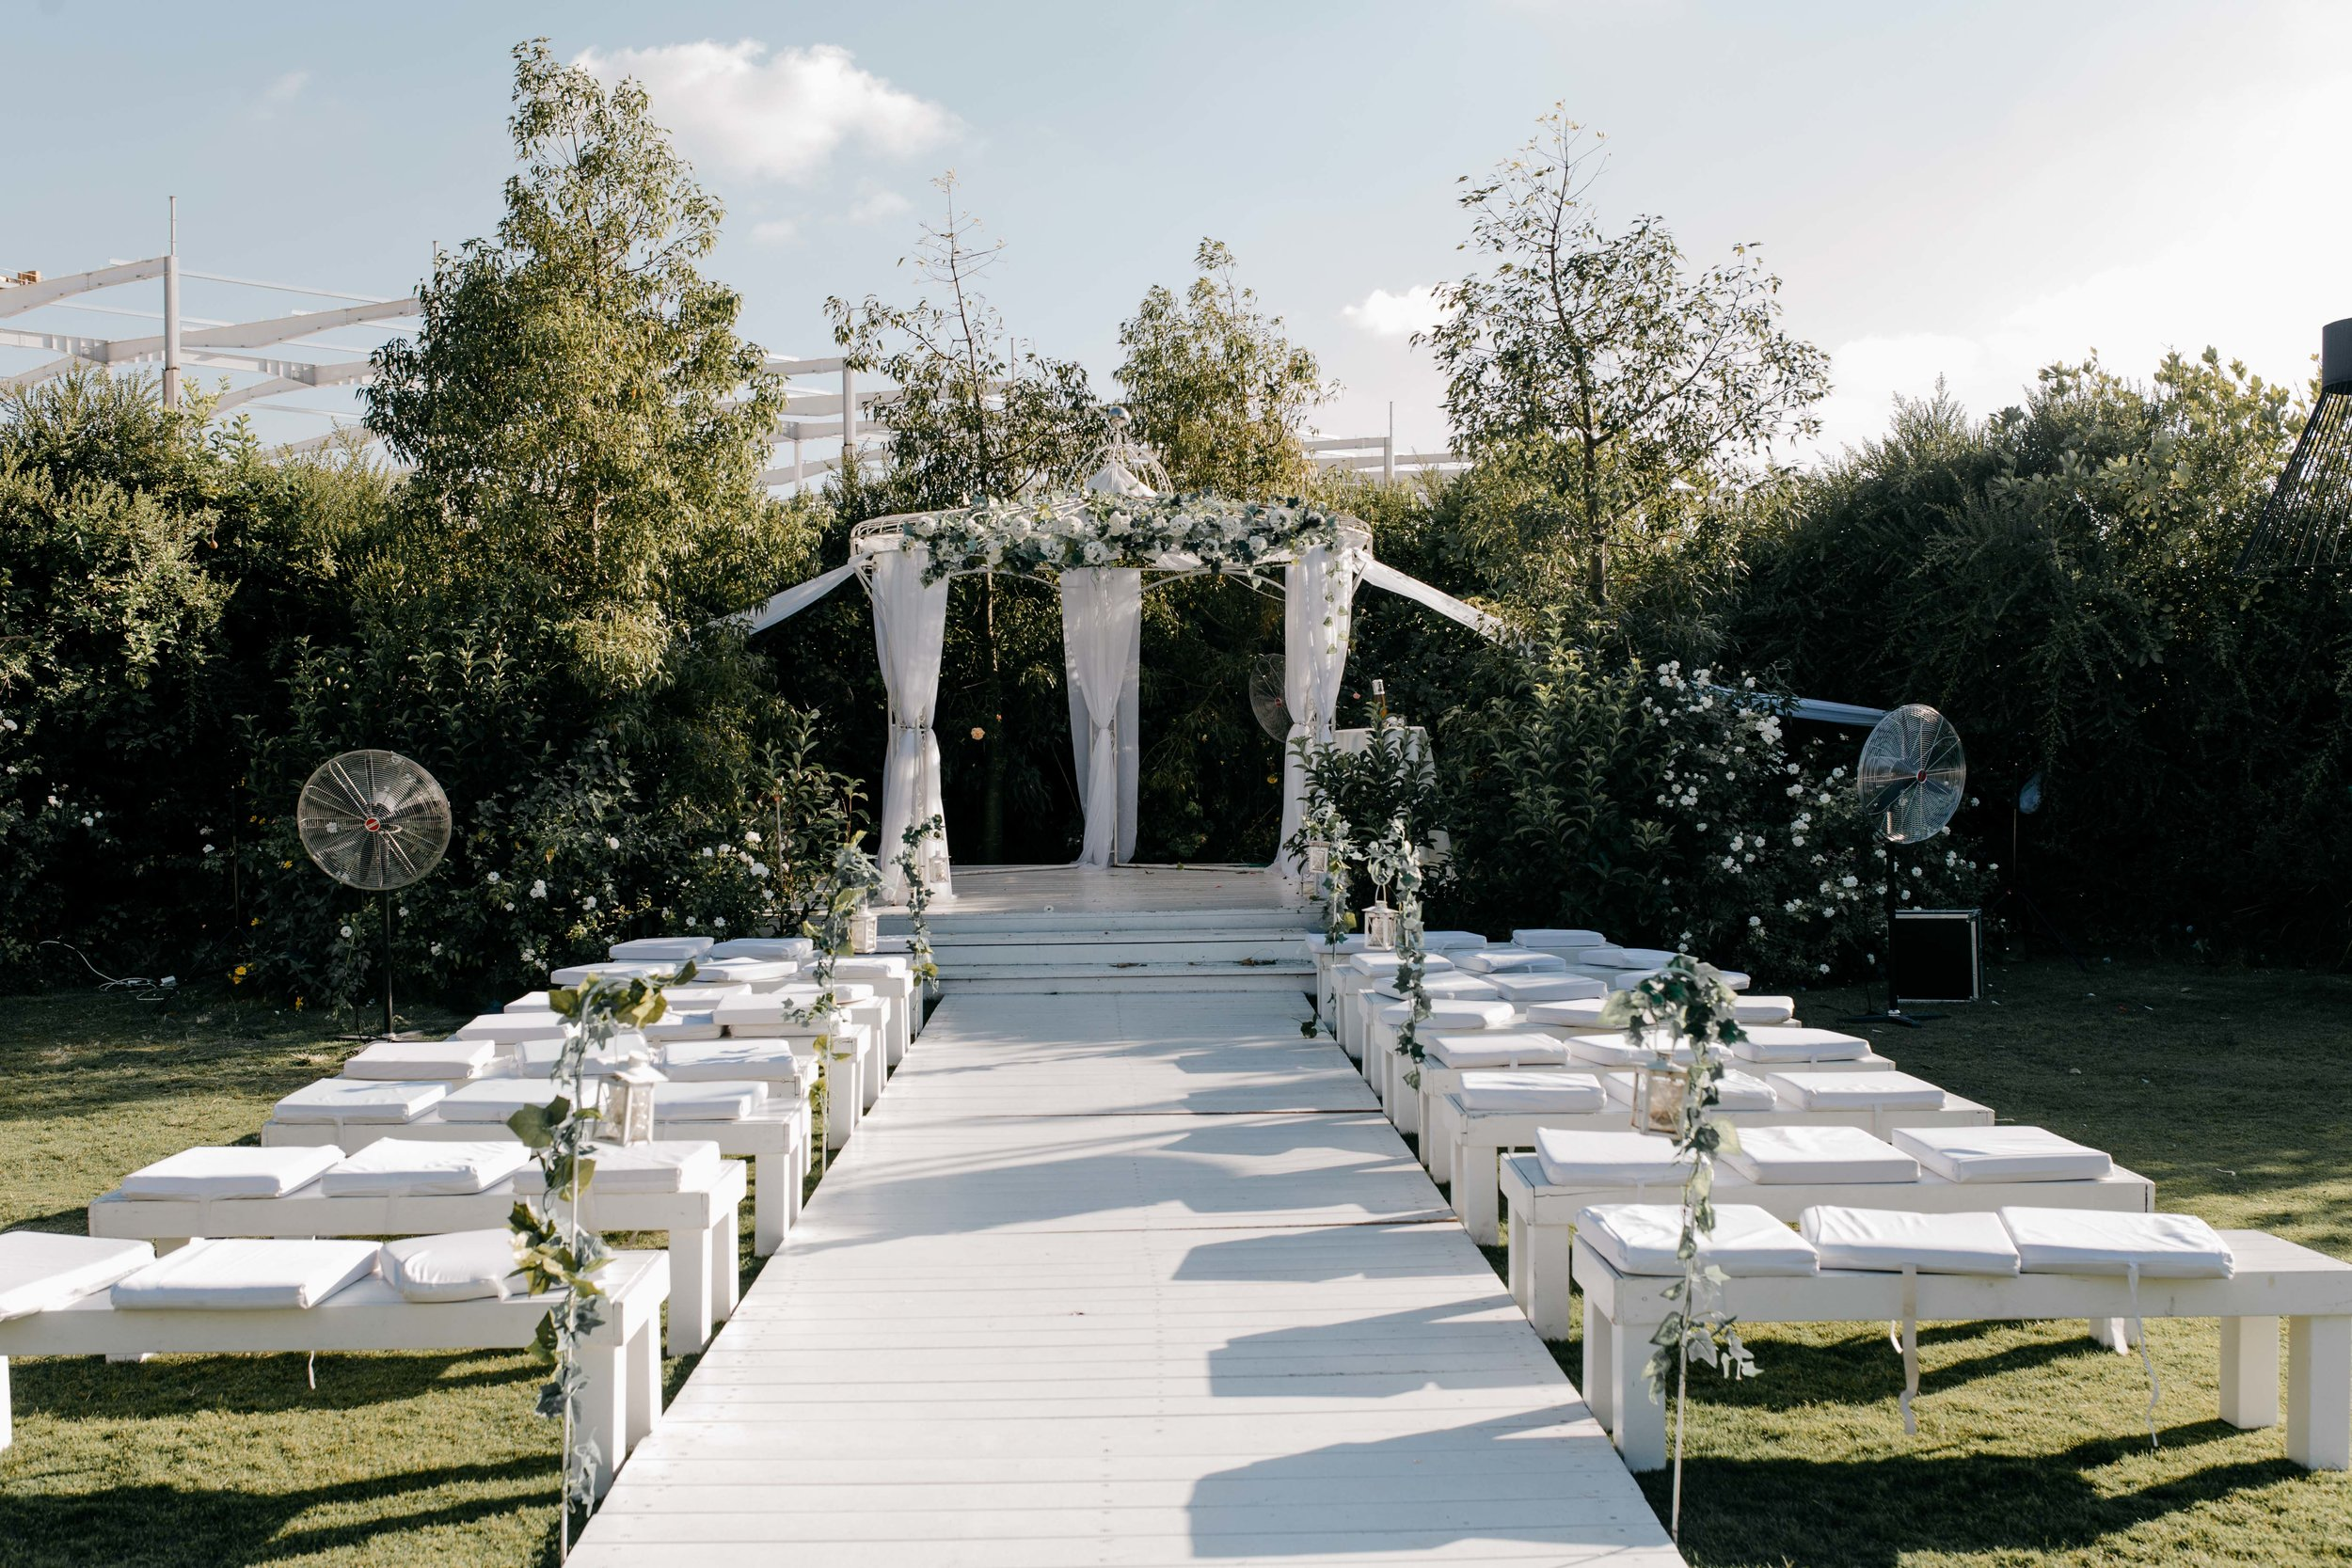 small wedding photographer in israel - nemjamin belhassen.JPG